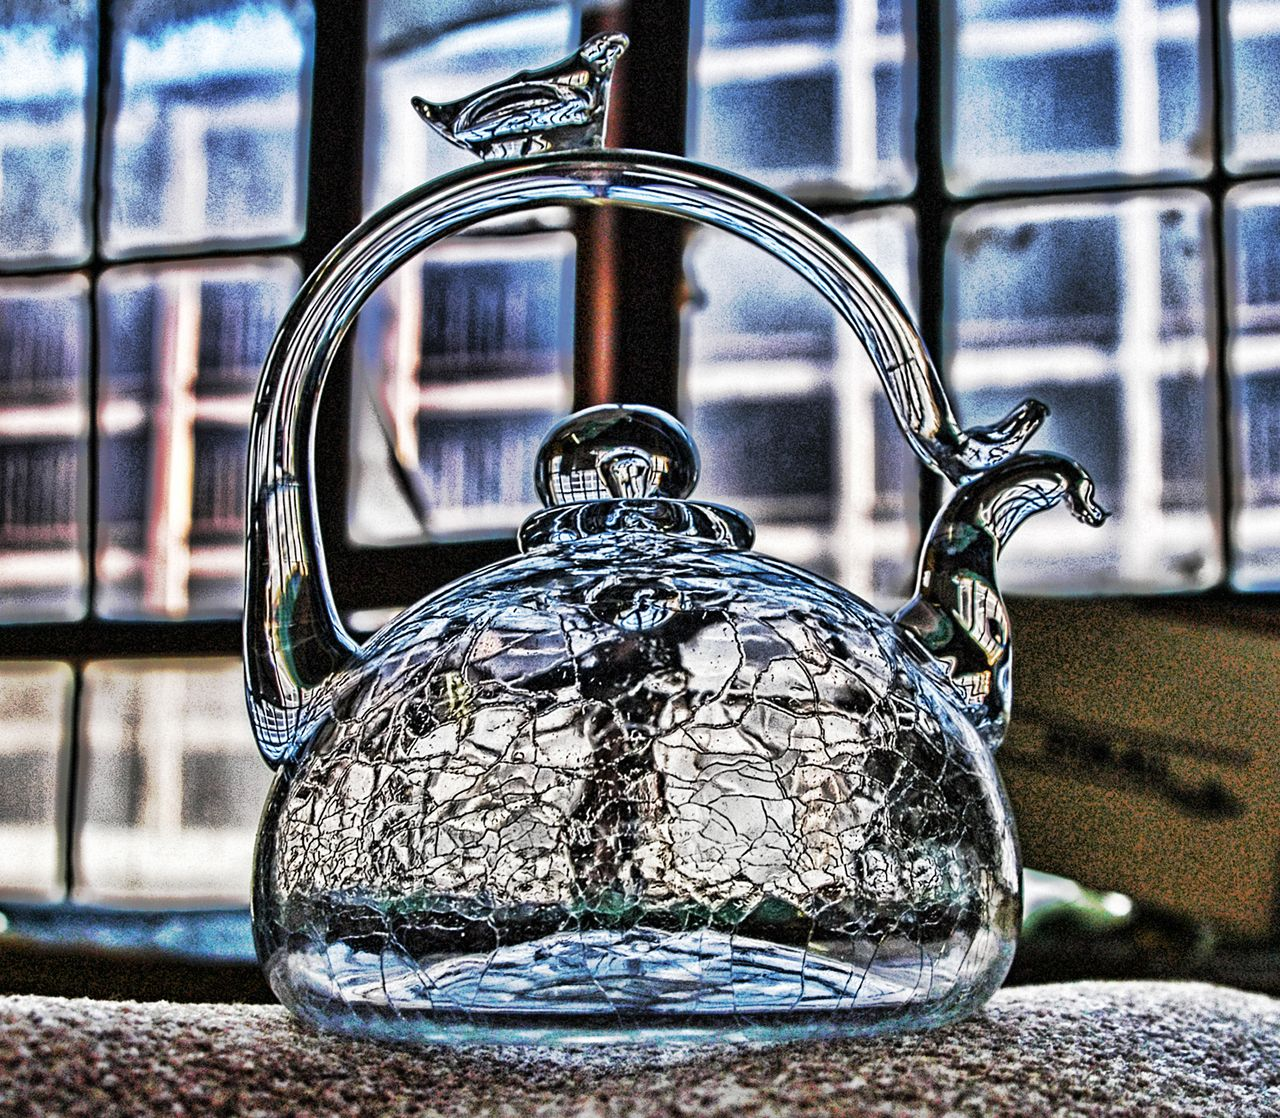 Hand Blown Tea Pot from the Michigan Glass Co. By: Michael Murphy #teapots